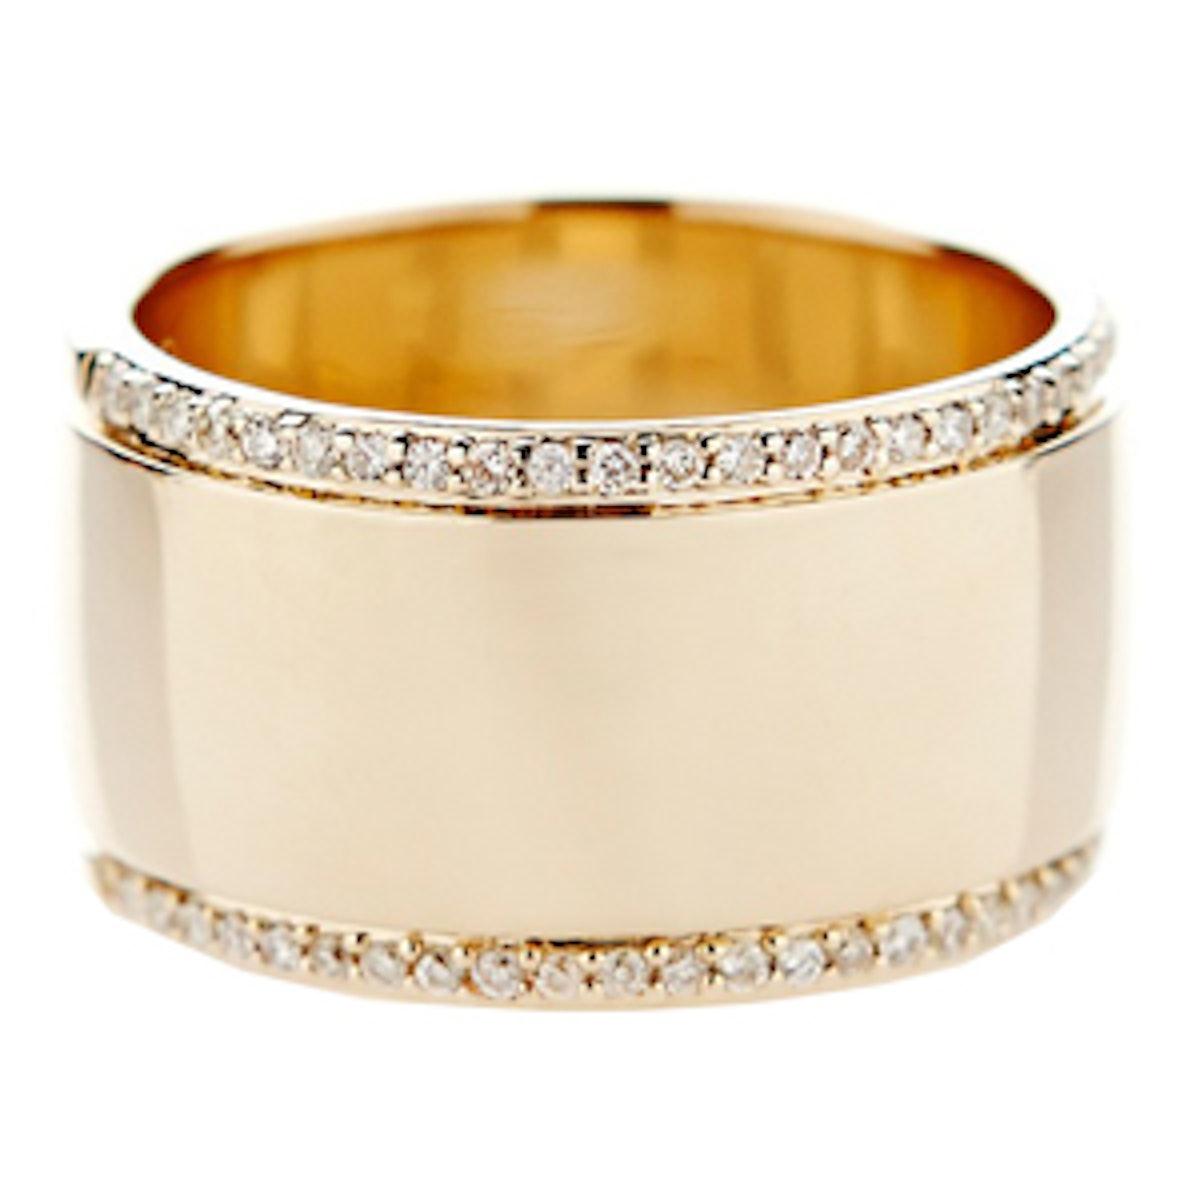 Pave Diamond & Yellow Gold Ring